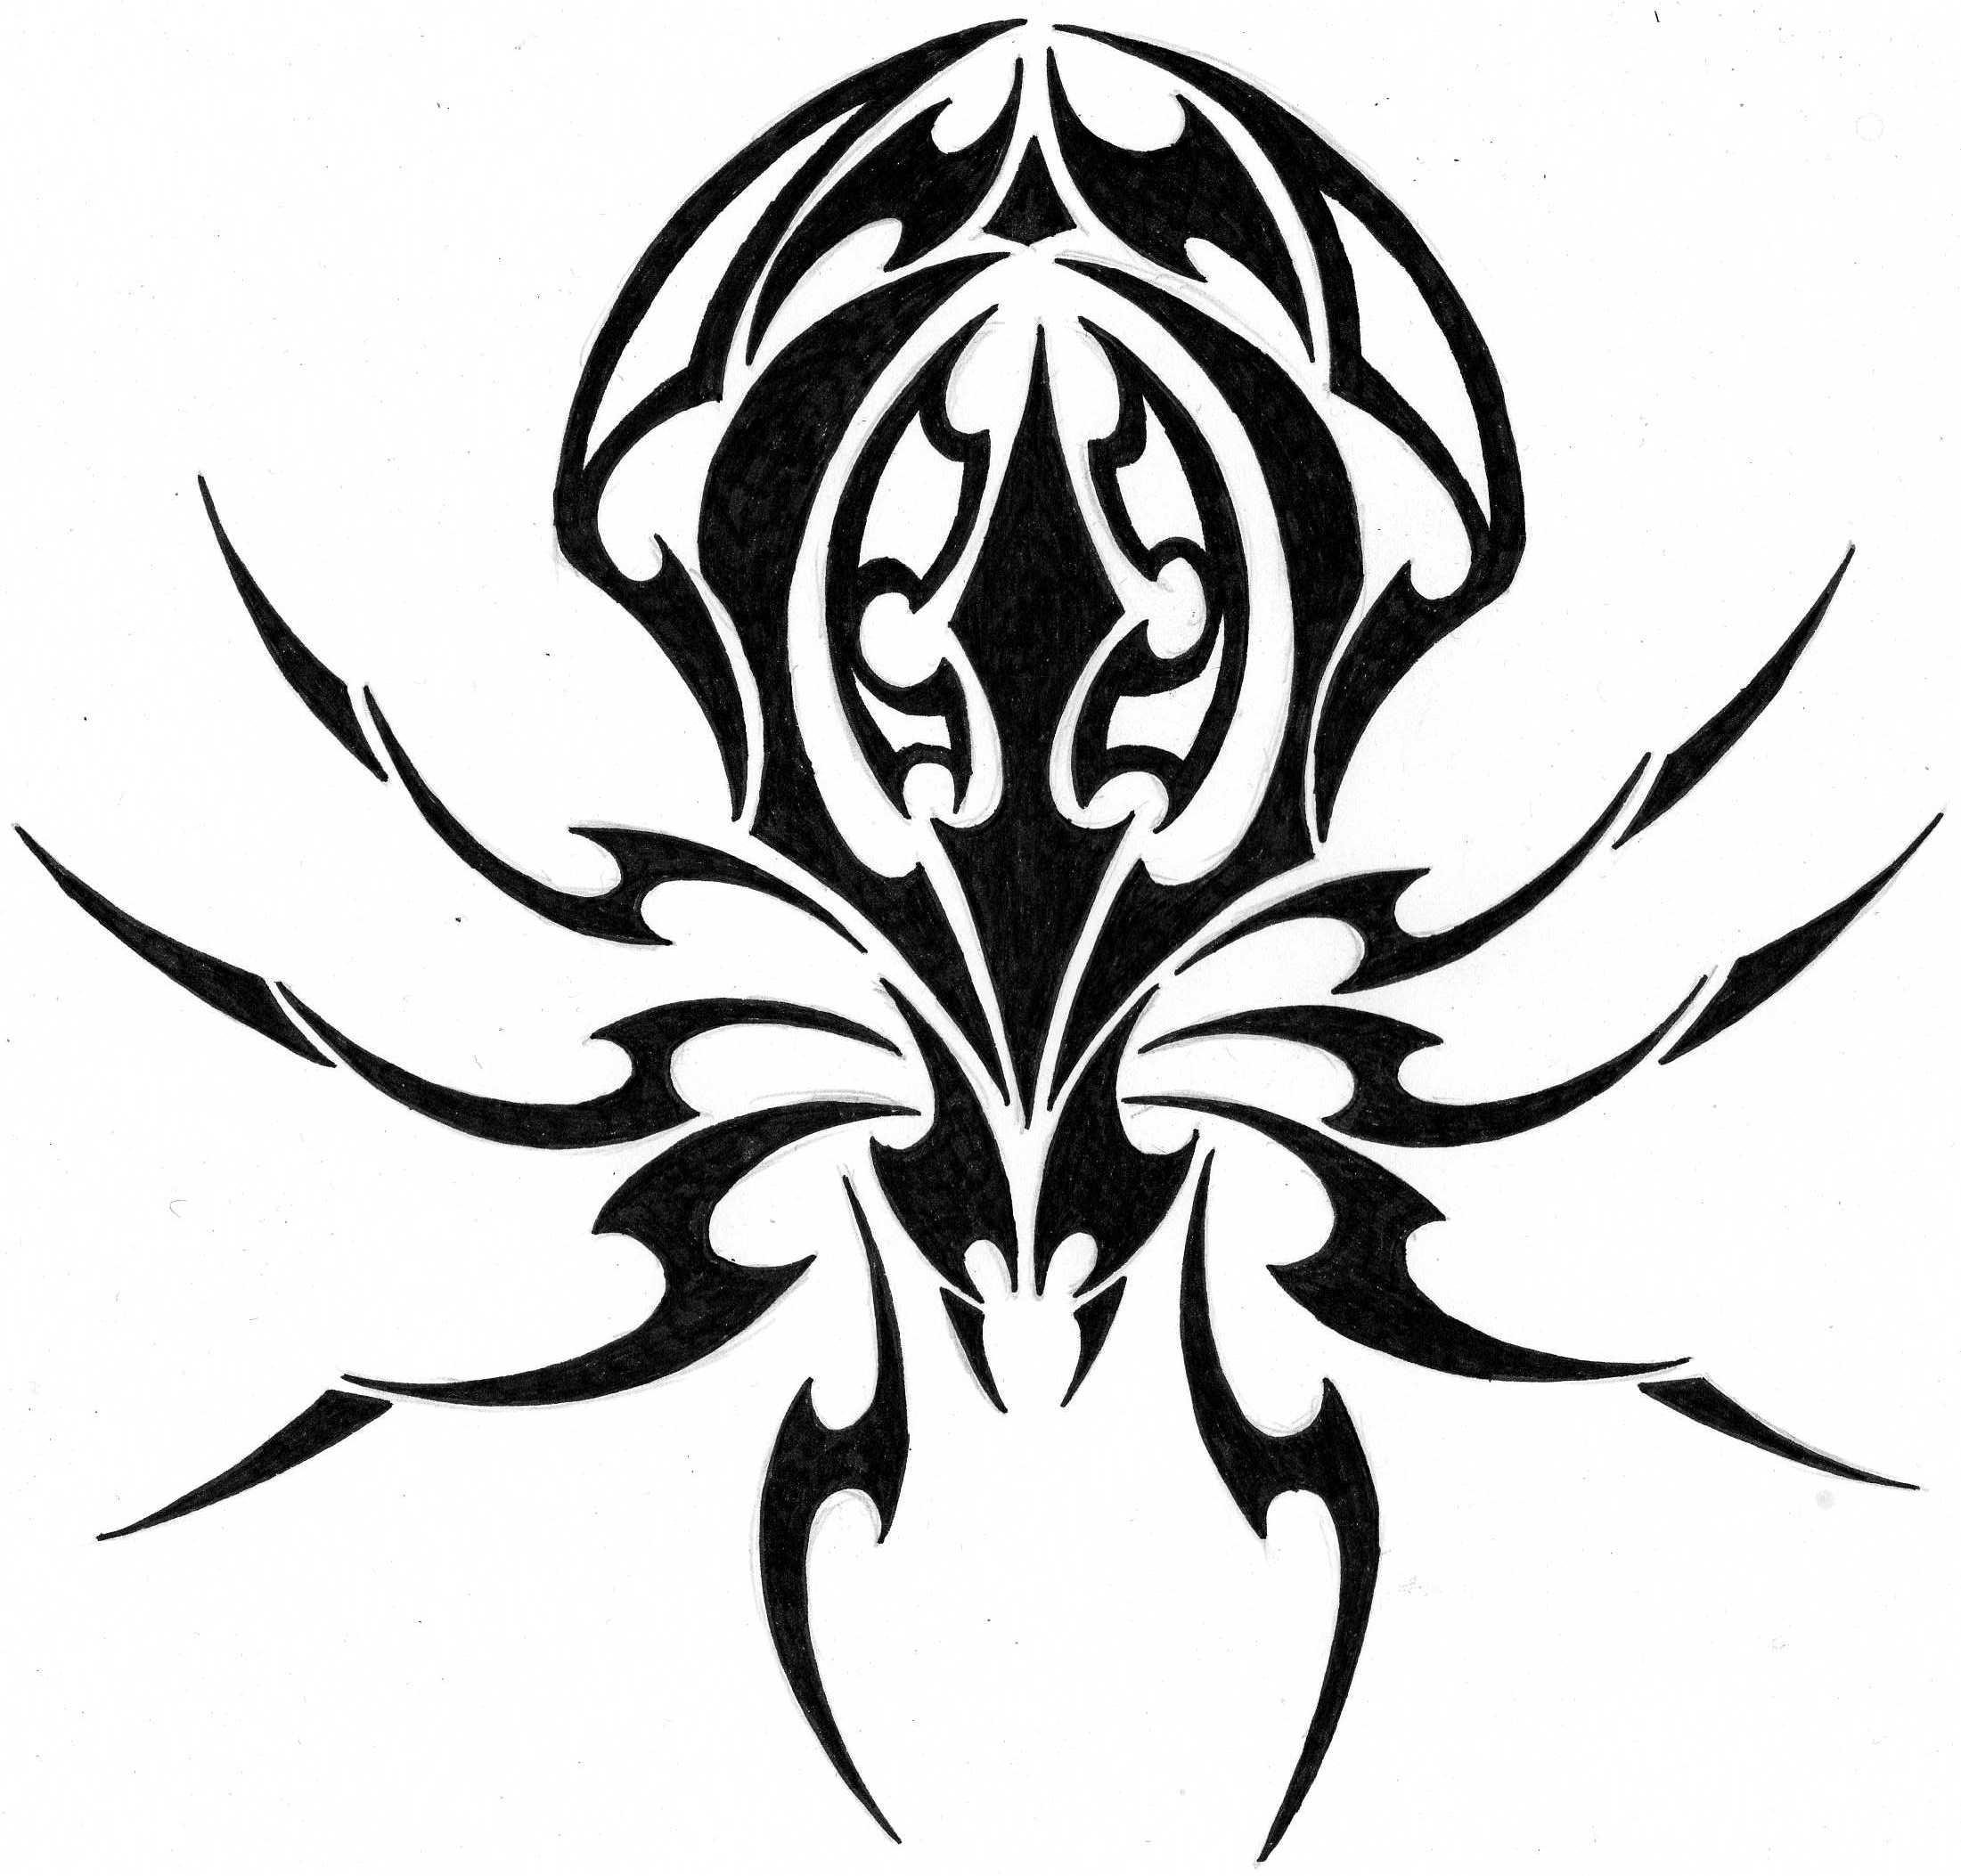 Spider Tribal tattoo by Aglinskas on DeviantArt